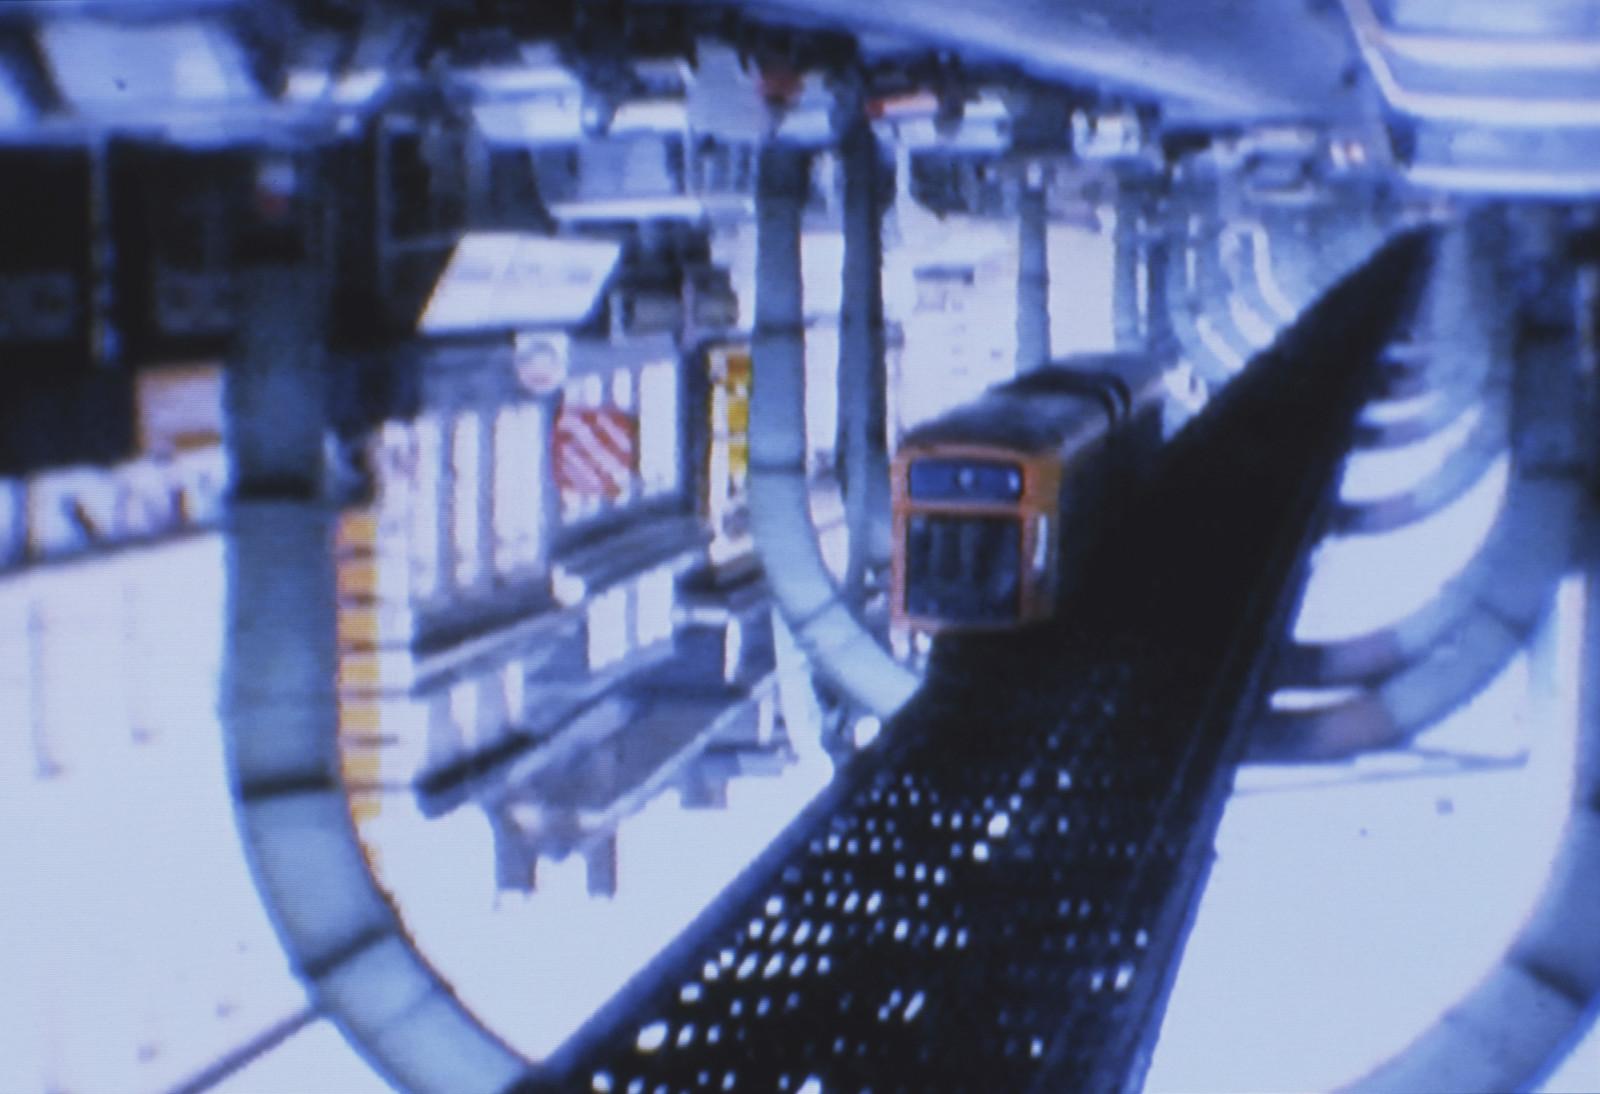 Video by Darren Almond, , dated 1995